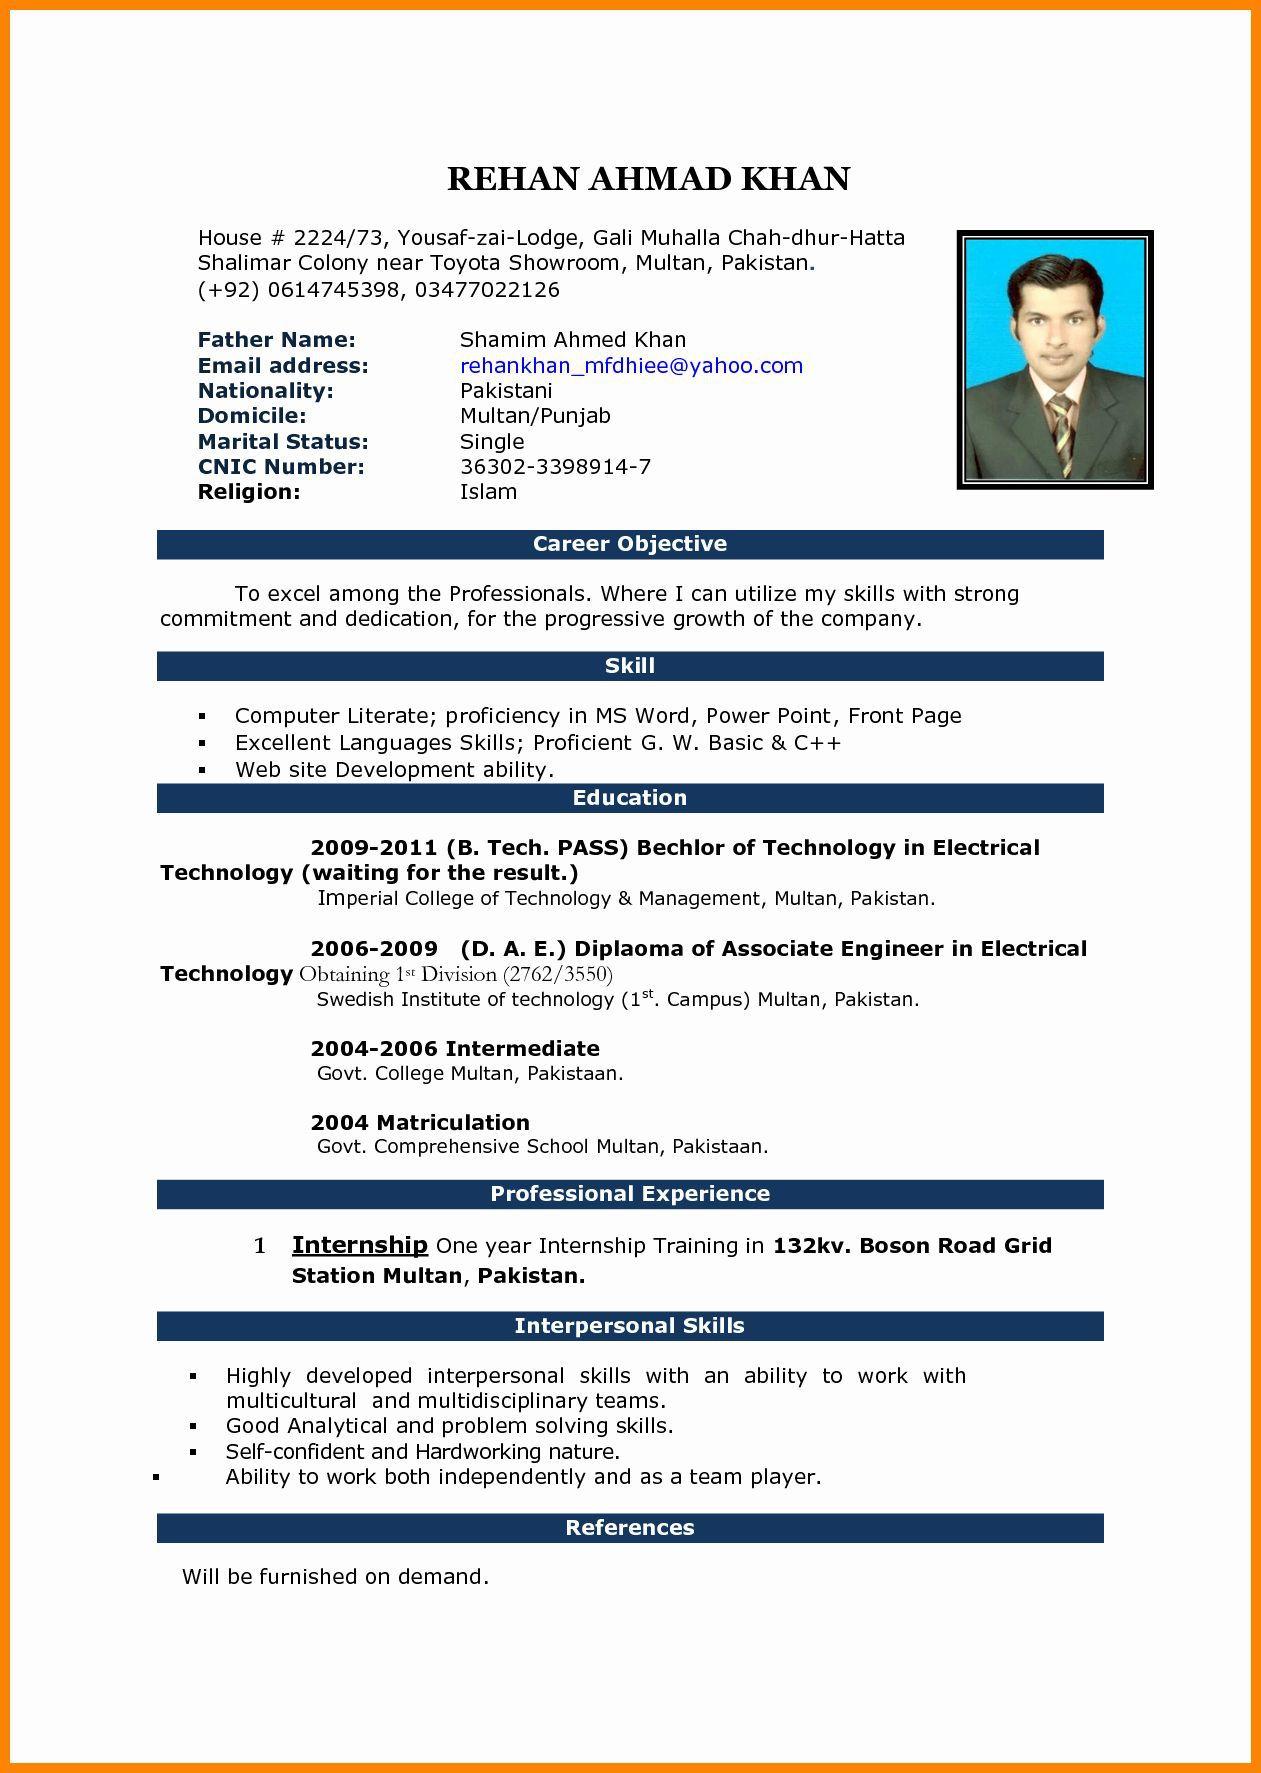 002 Phenomenal Free Resume Template Microsoft Word 2010 High Def  Cv DownloadFull